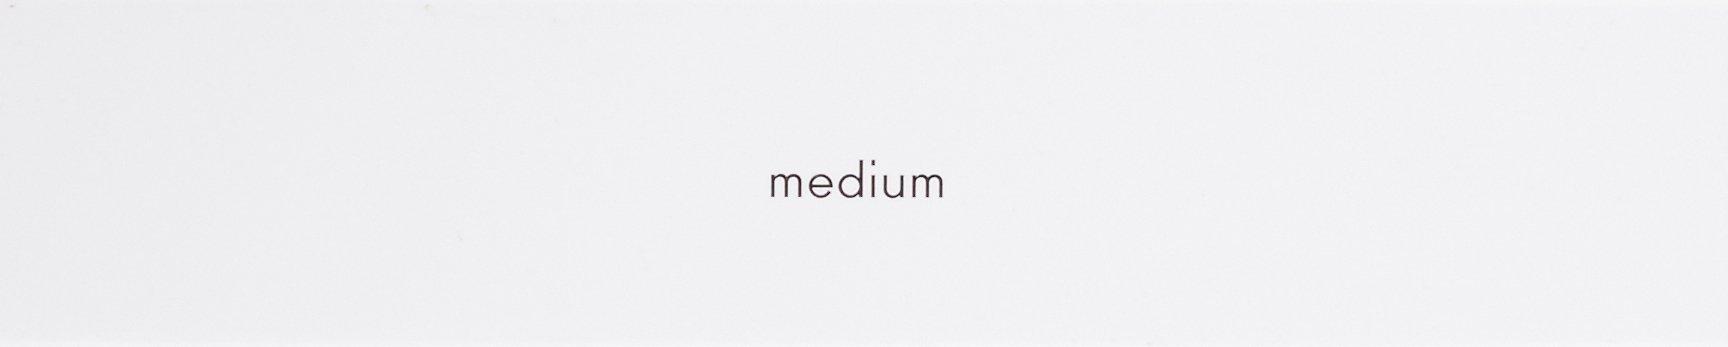 jane iredale Pure & Simple Makeup Kit, Medium.40 oz. by jane iredale (Image #4)